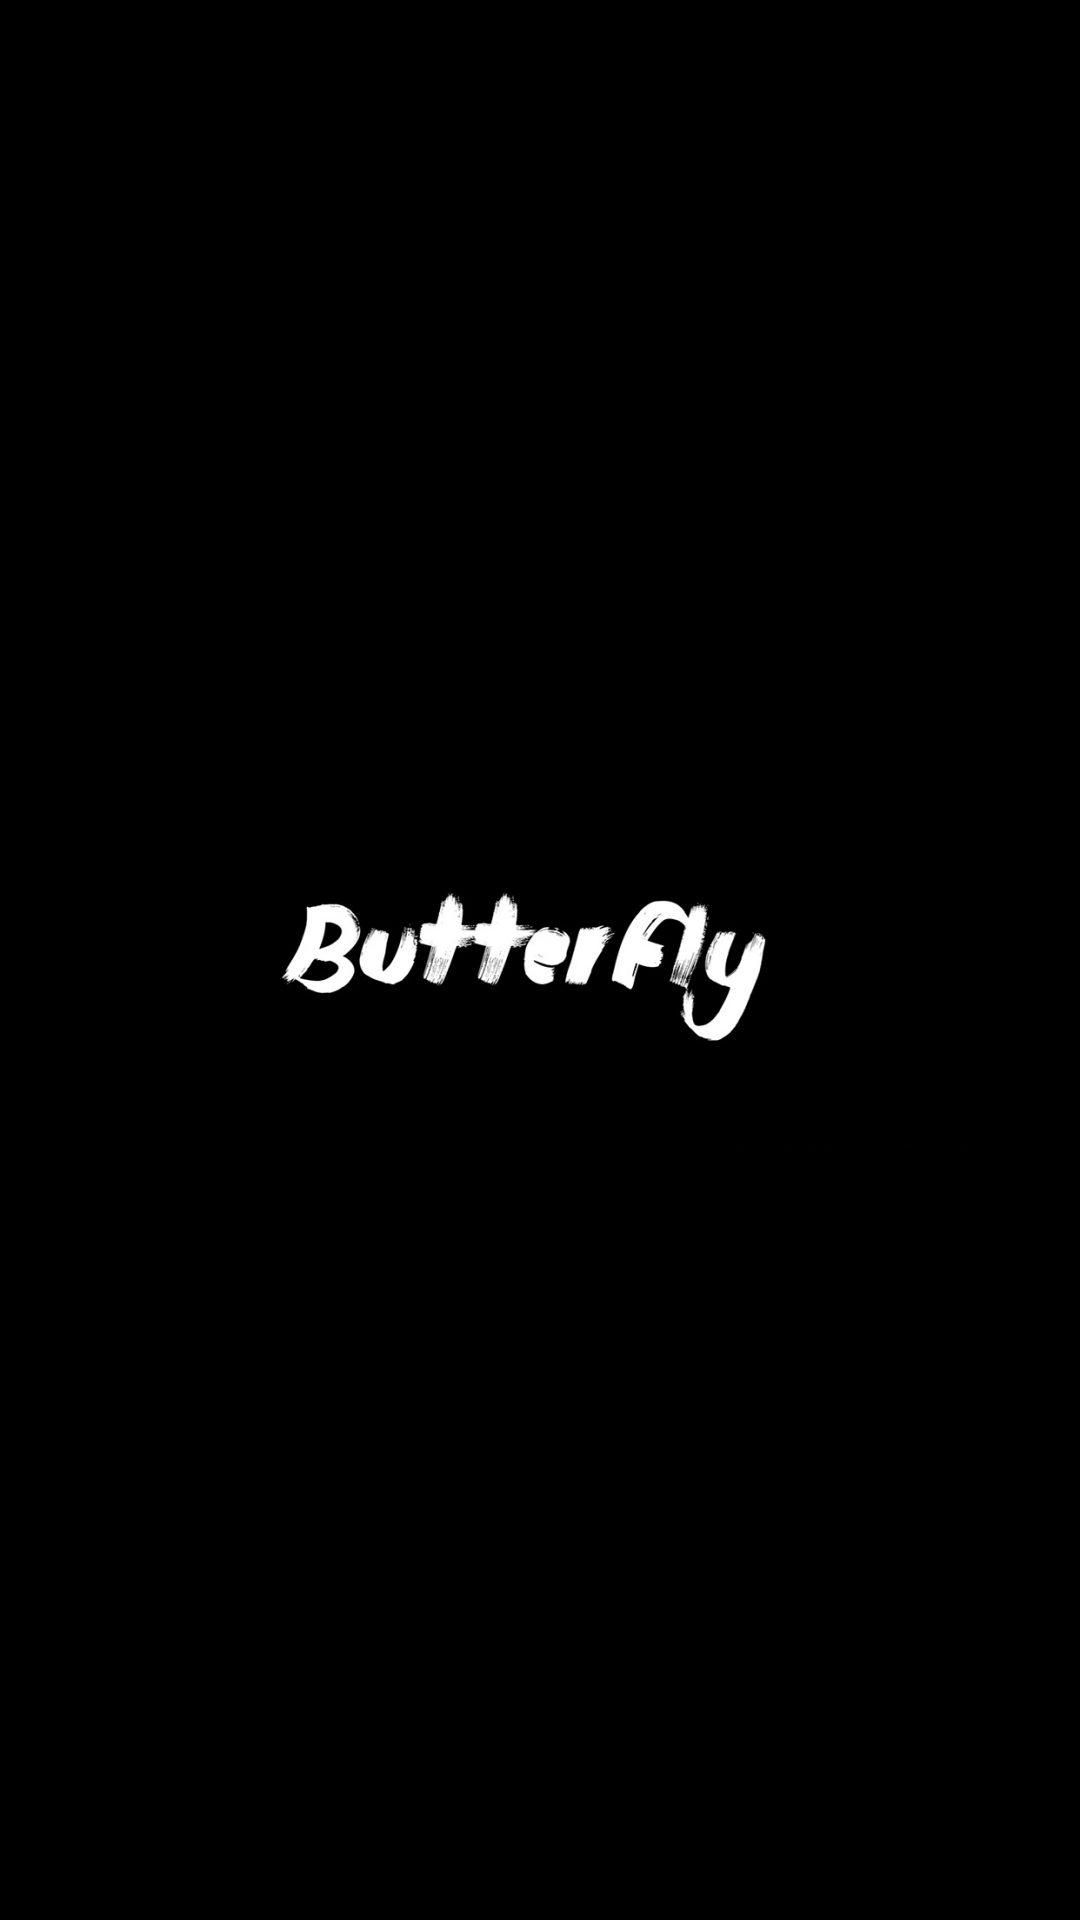 Christina Perri Logo Butterfly Music